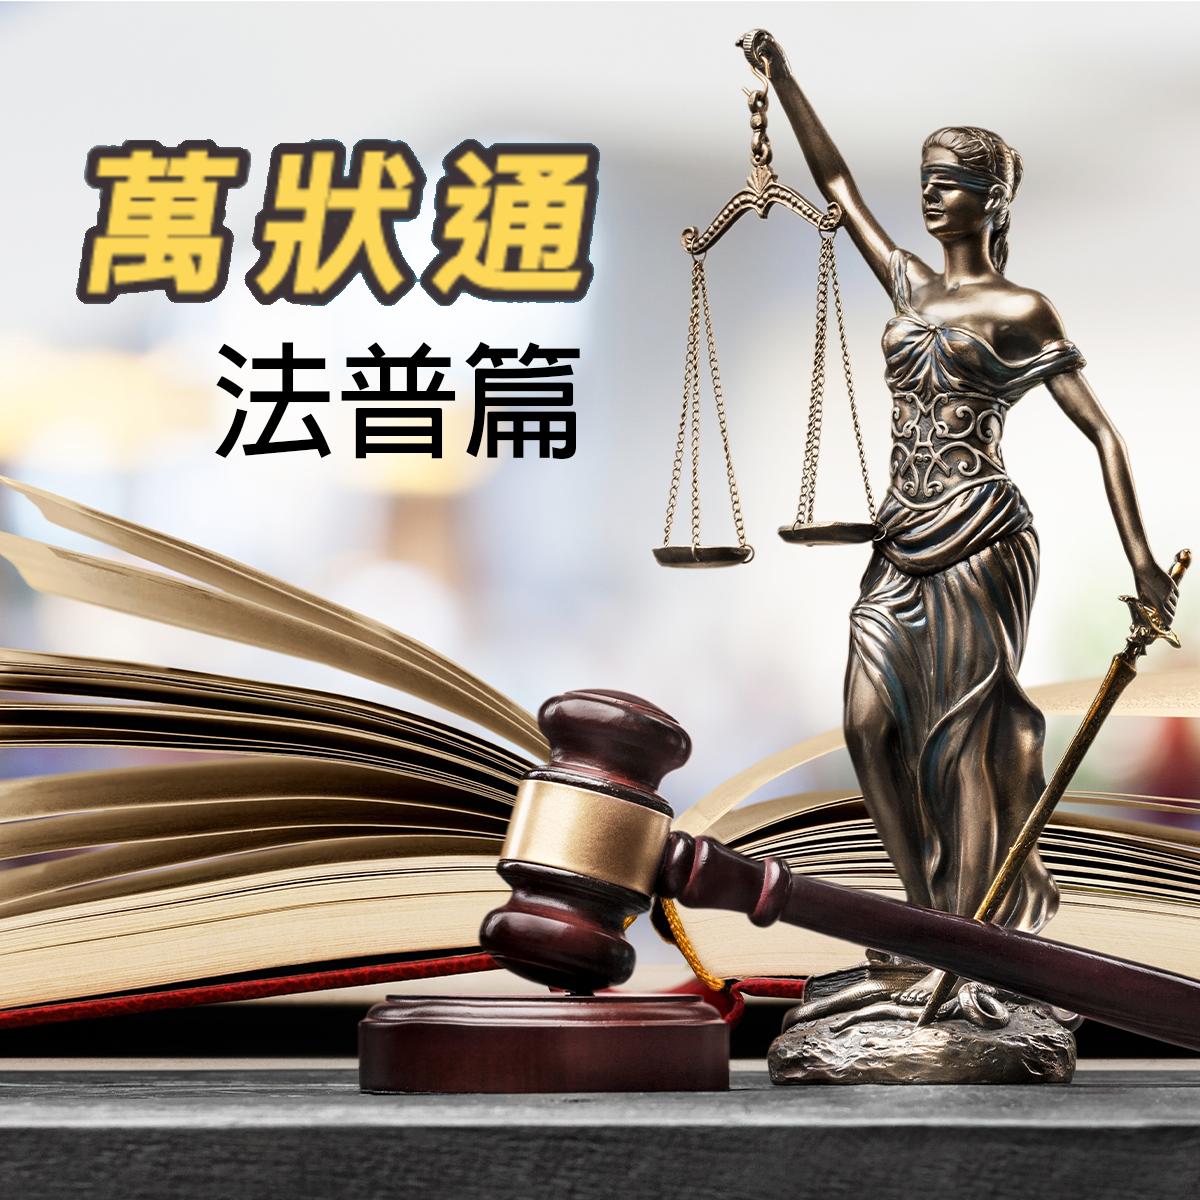 EP23【雷公尛 ⚖️ 法律】校園霸凌事件、網路交友詐騙!(外國)學生們向律師求助管道有哪些呢?